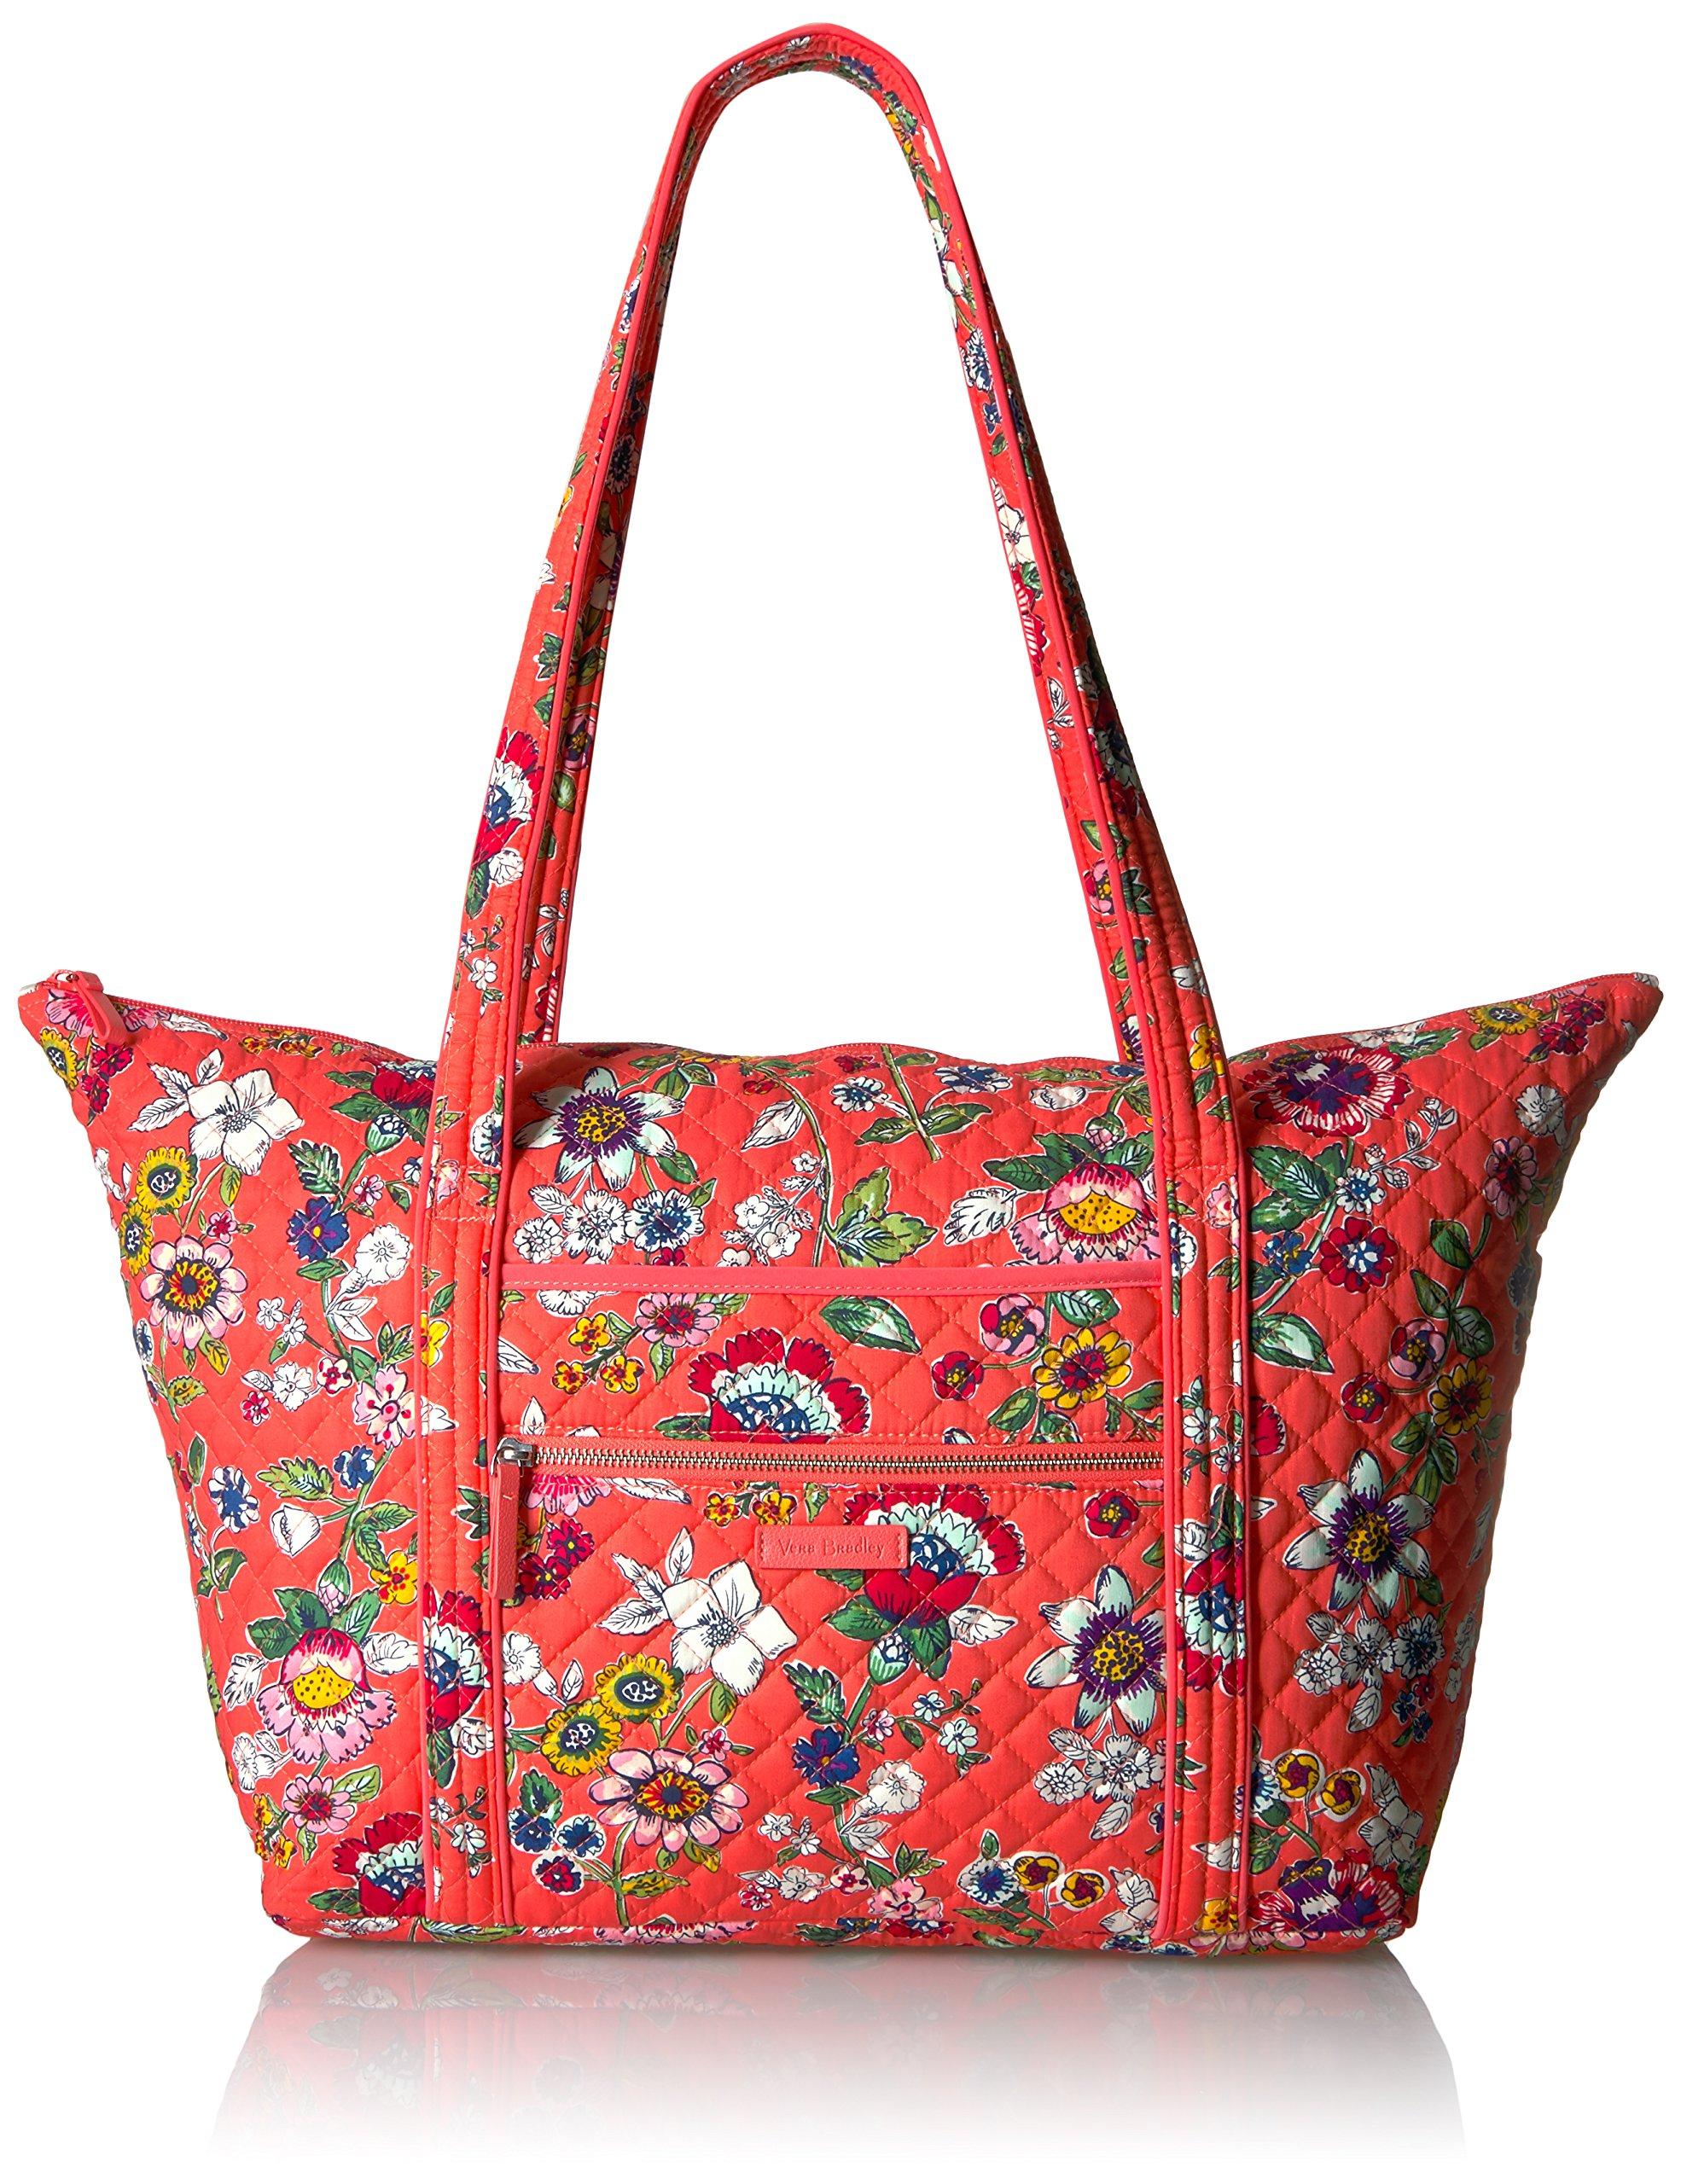 Vera Bradley Women's Iconic Miller Travel Bag-Signature